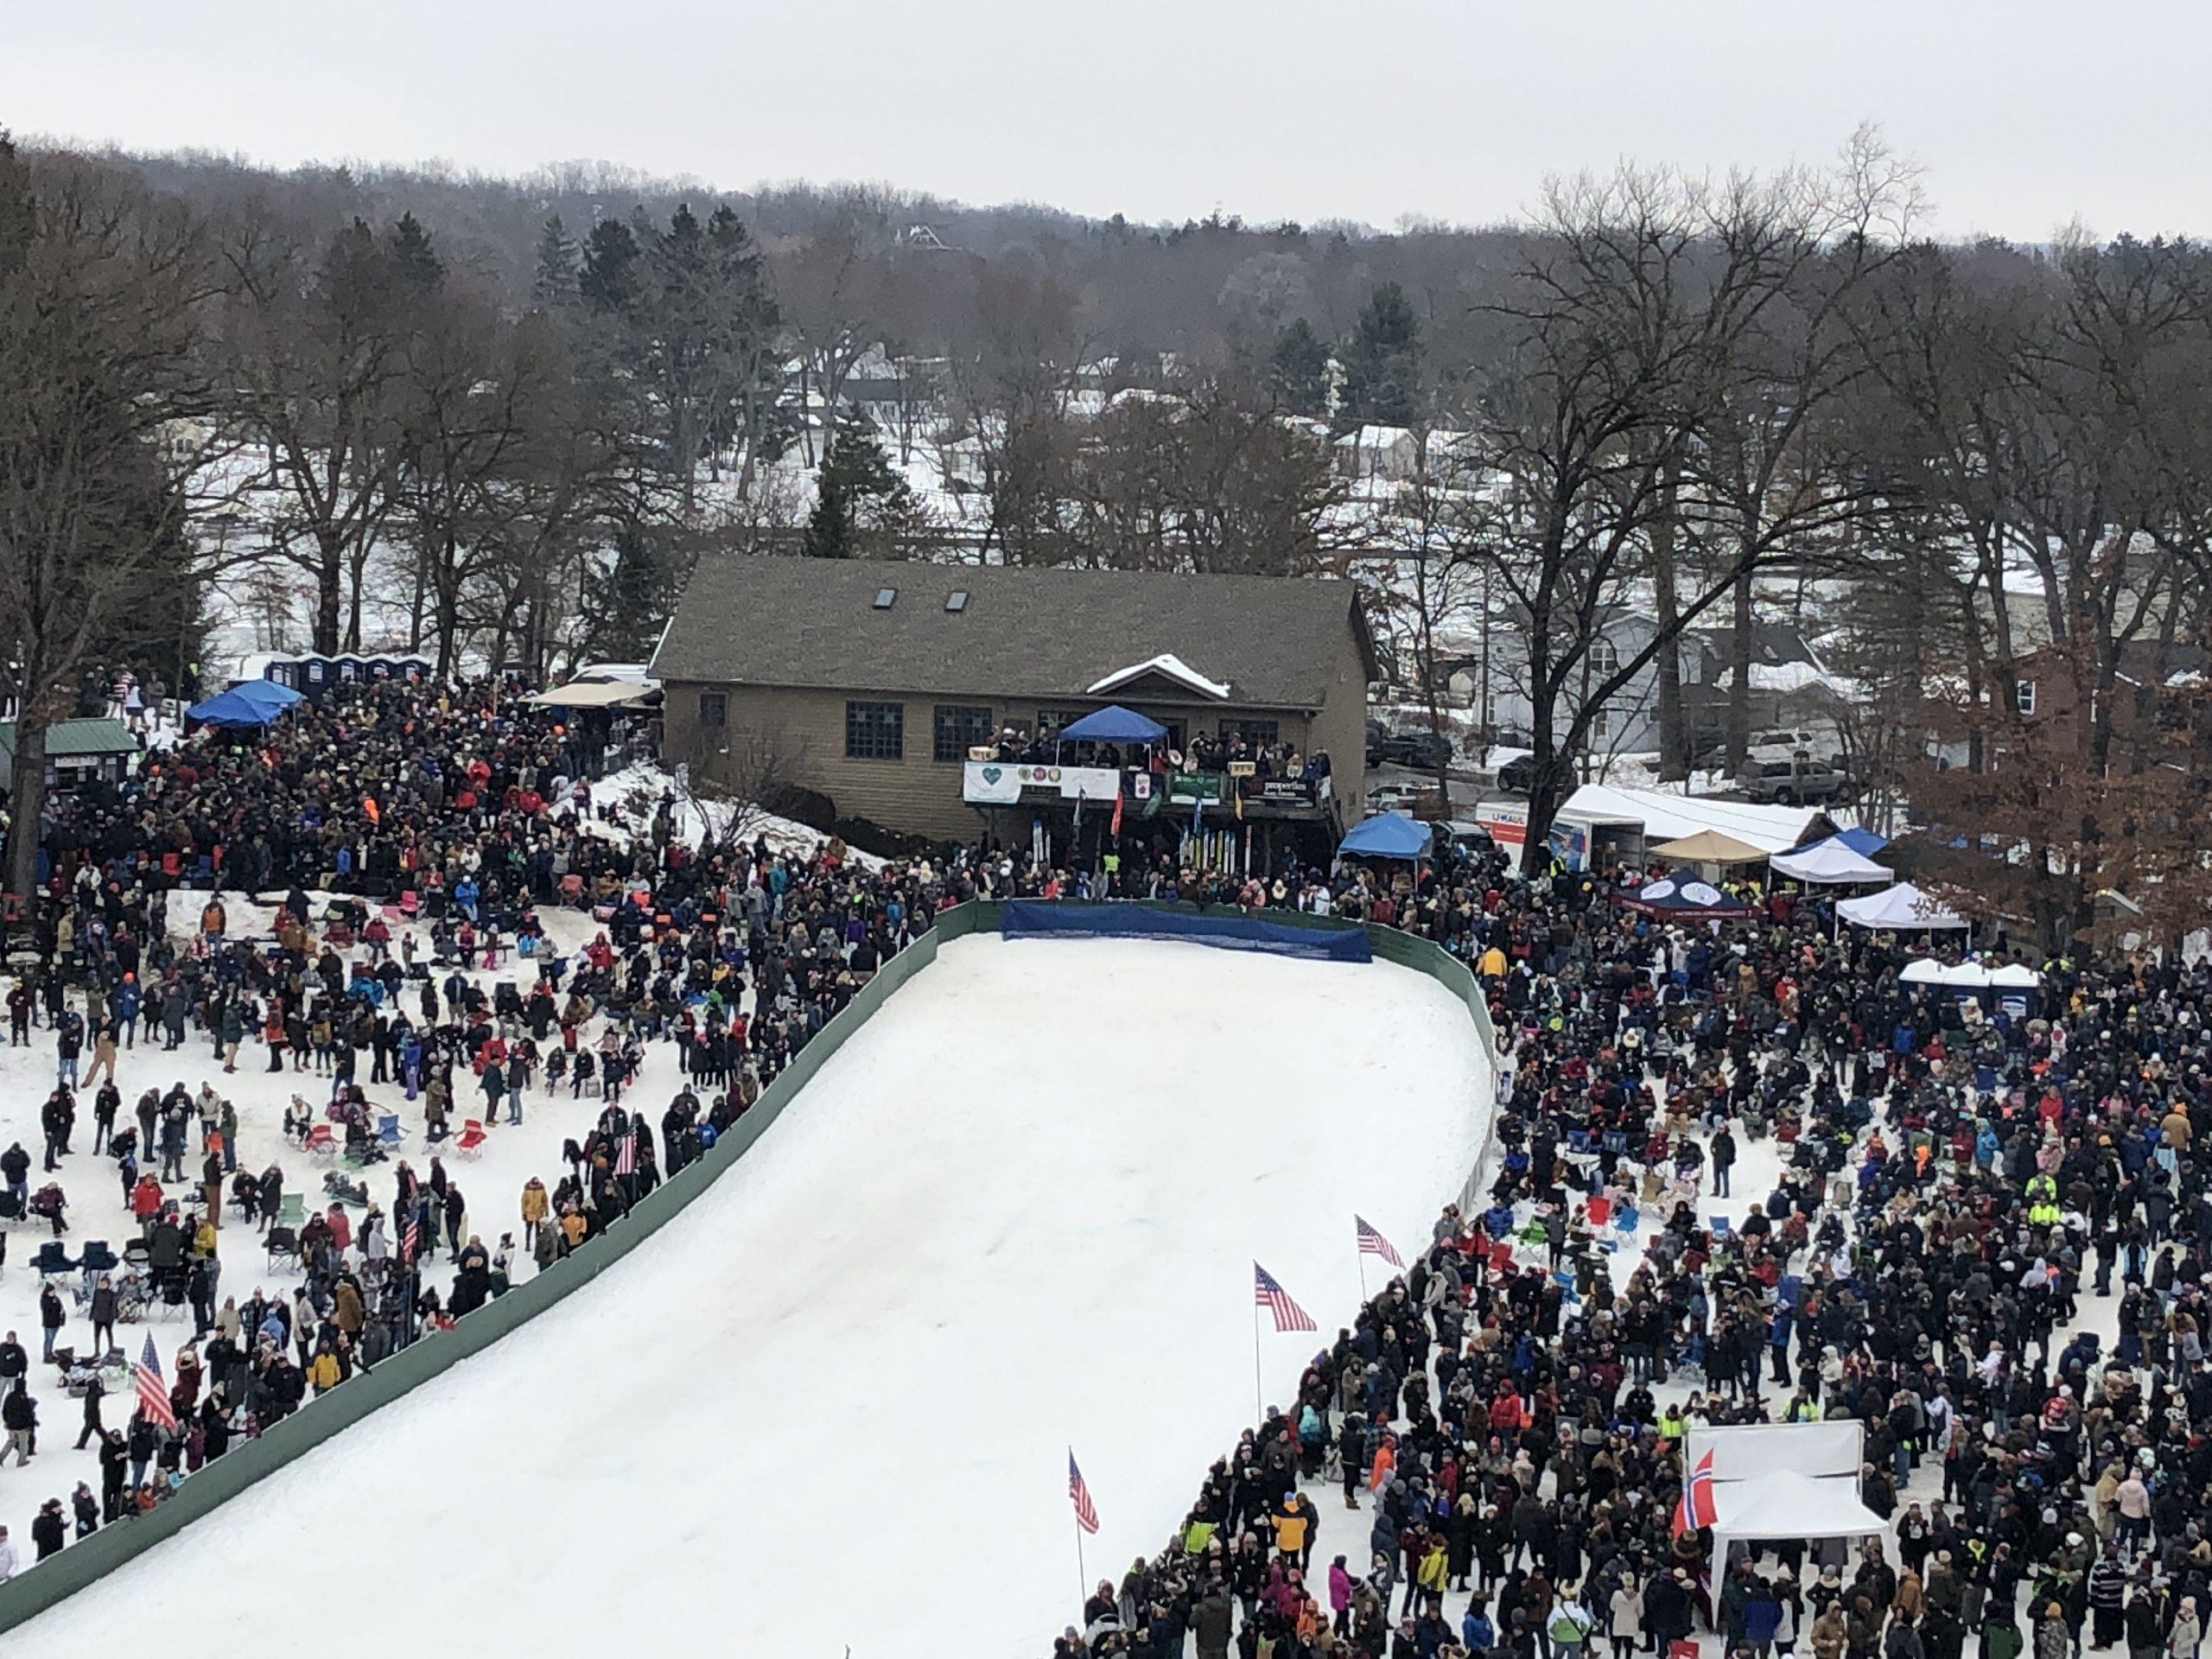 Norge Ski Club Winter Tournament